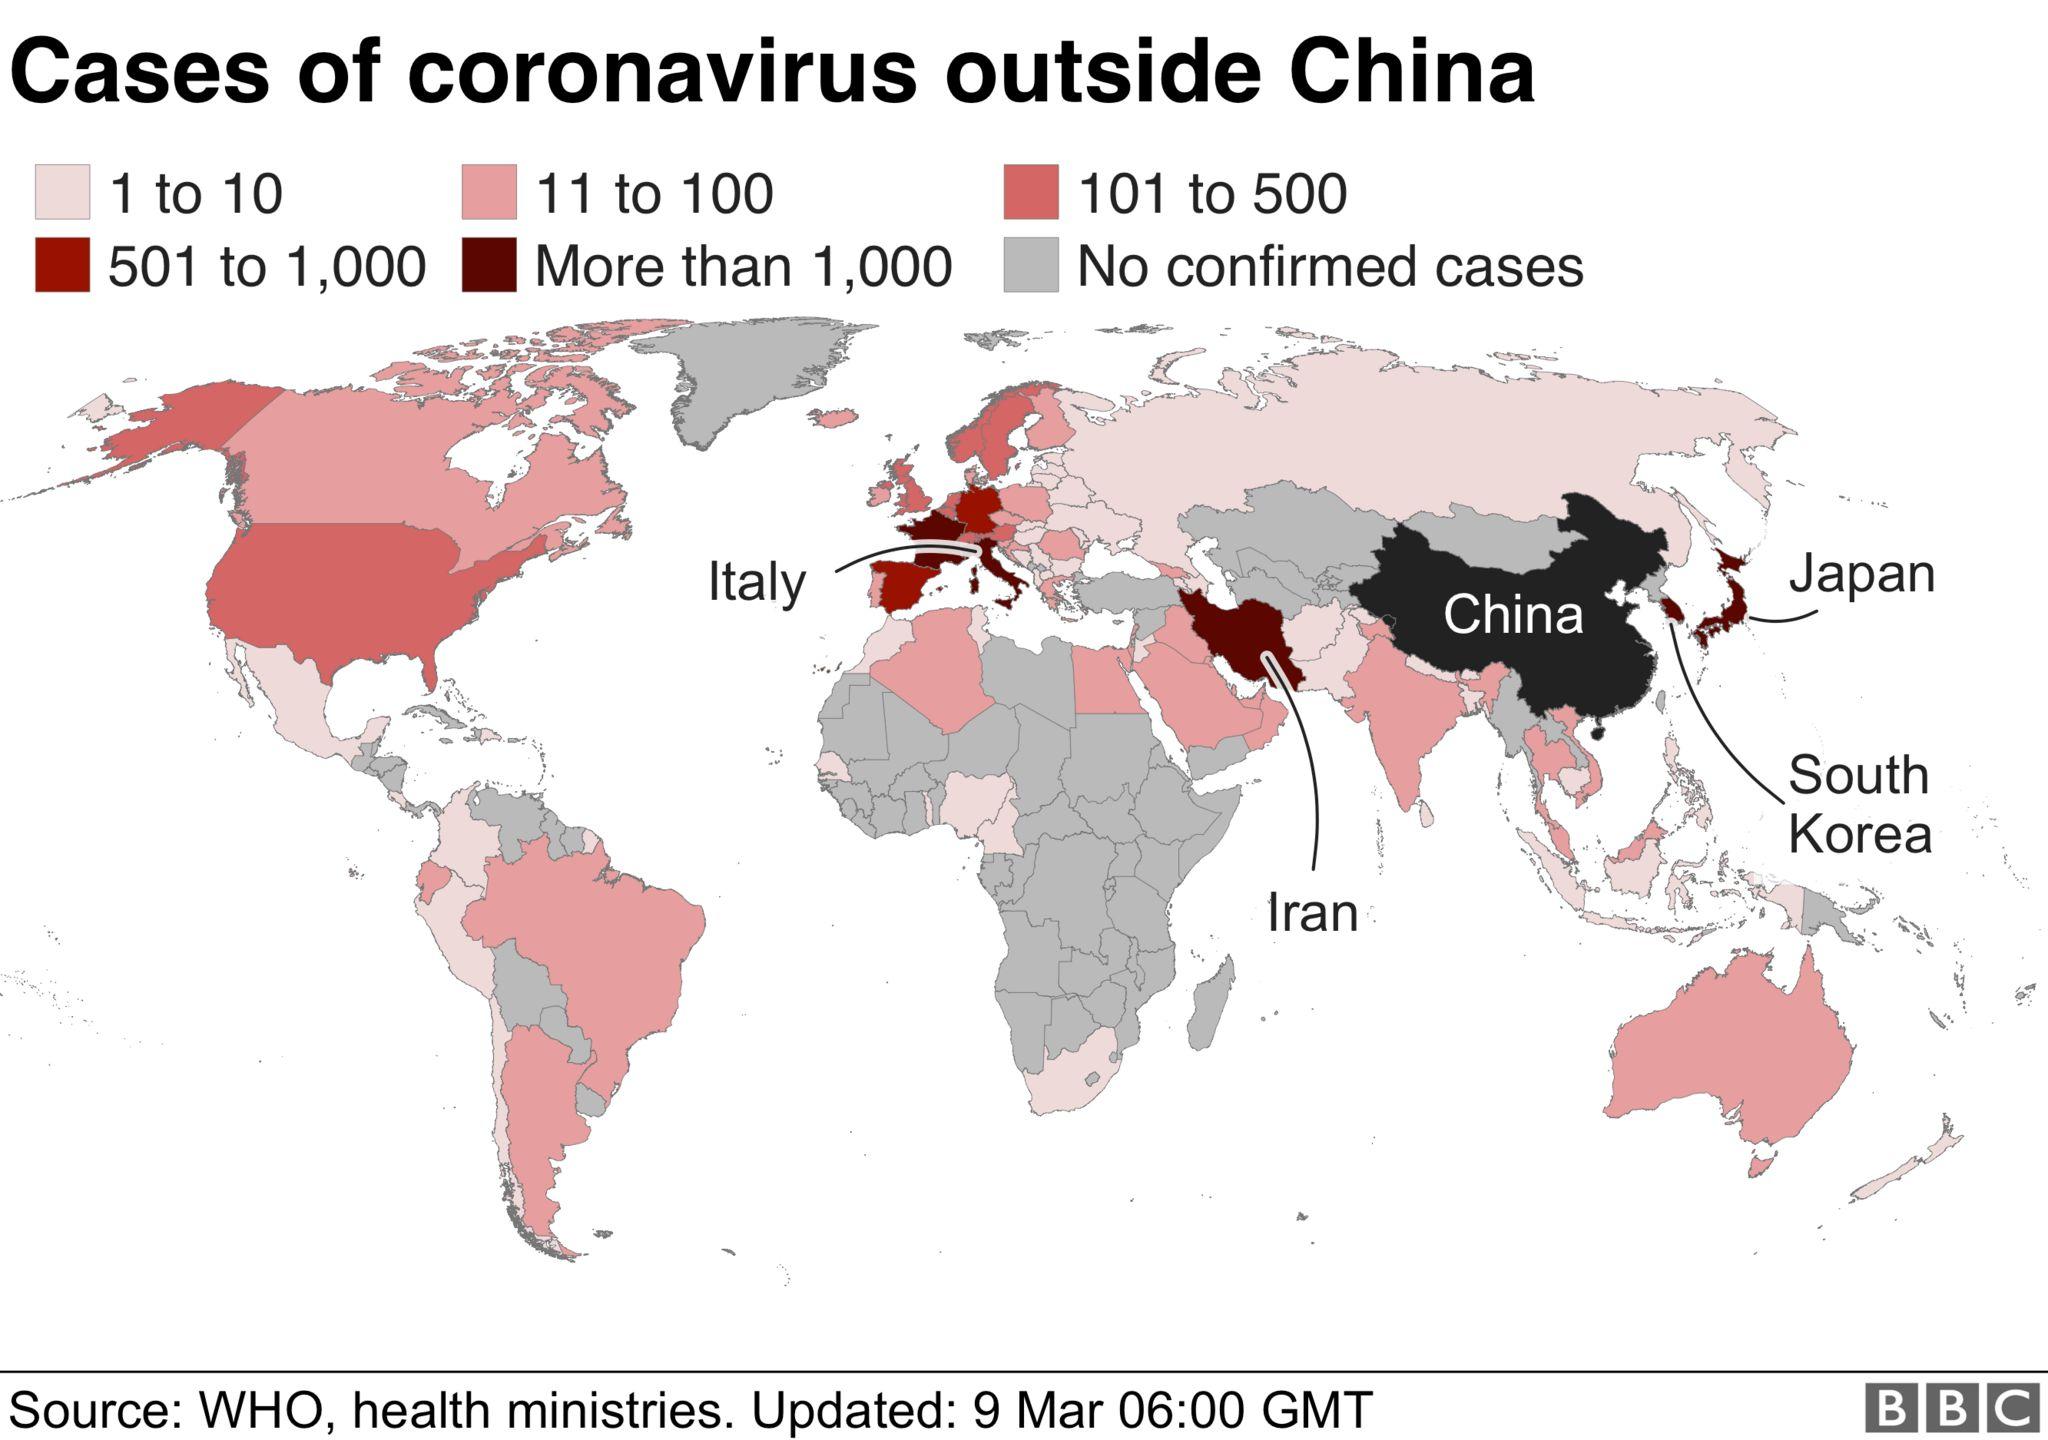 Cases of coronavirus outside China